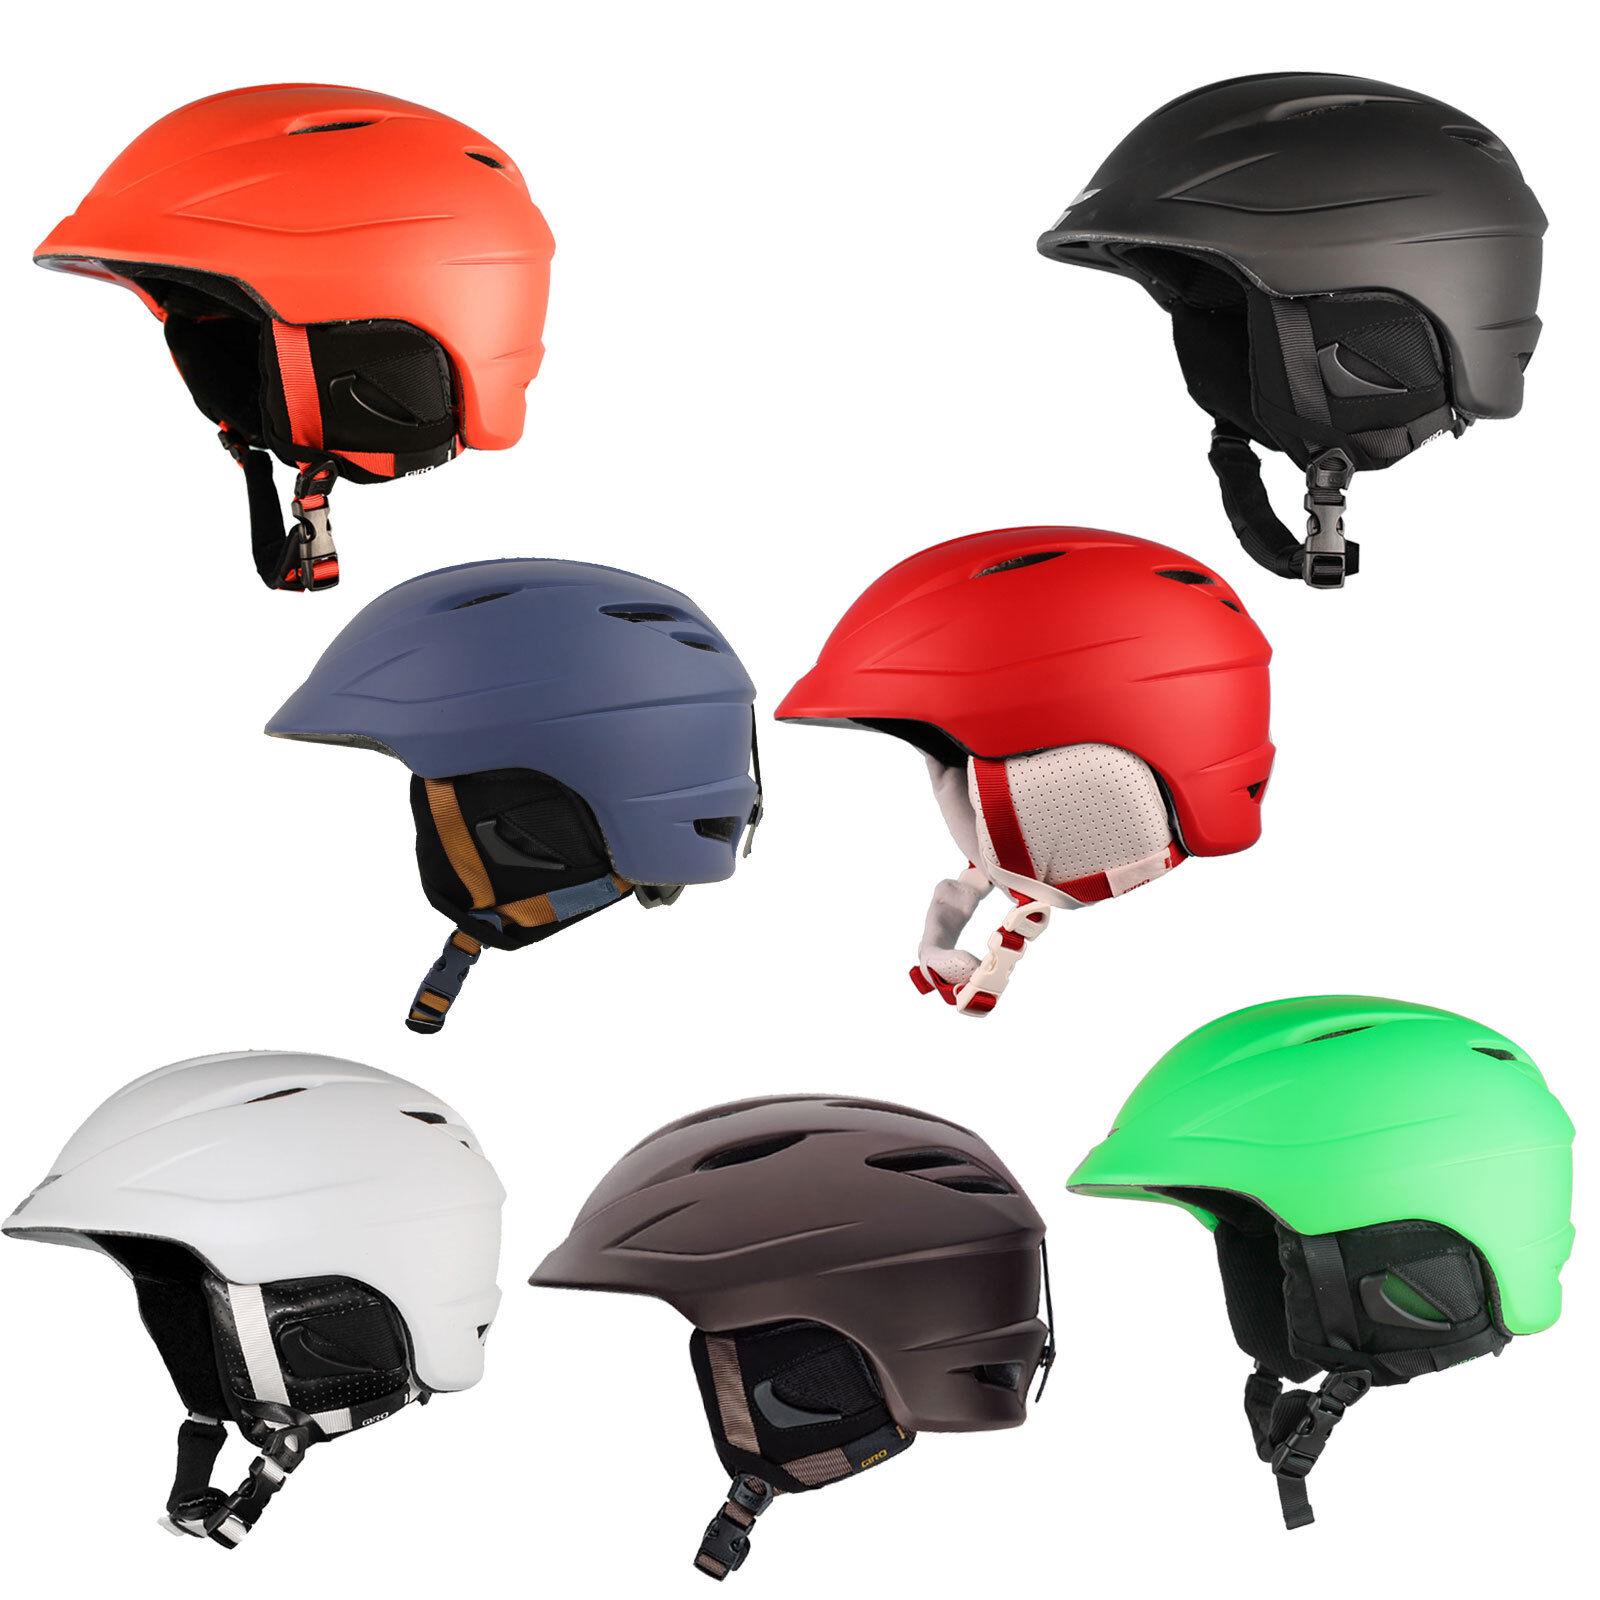 Giro Seam Mens Snowboard Helmet Helmet Ski Snowboard  Winter Sports Helmet  enjoy saving 30-50% off